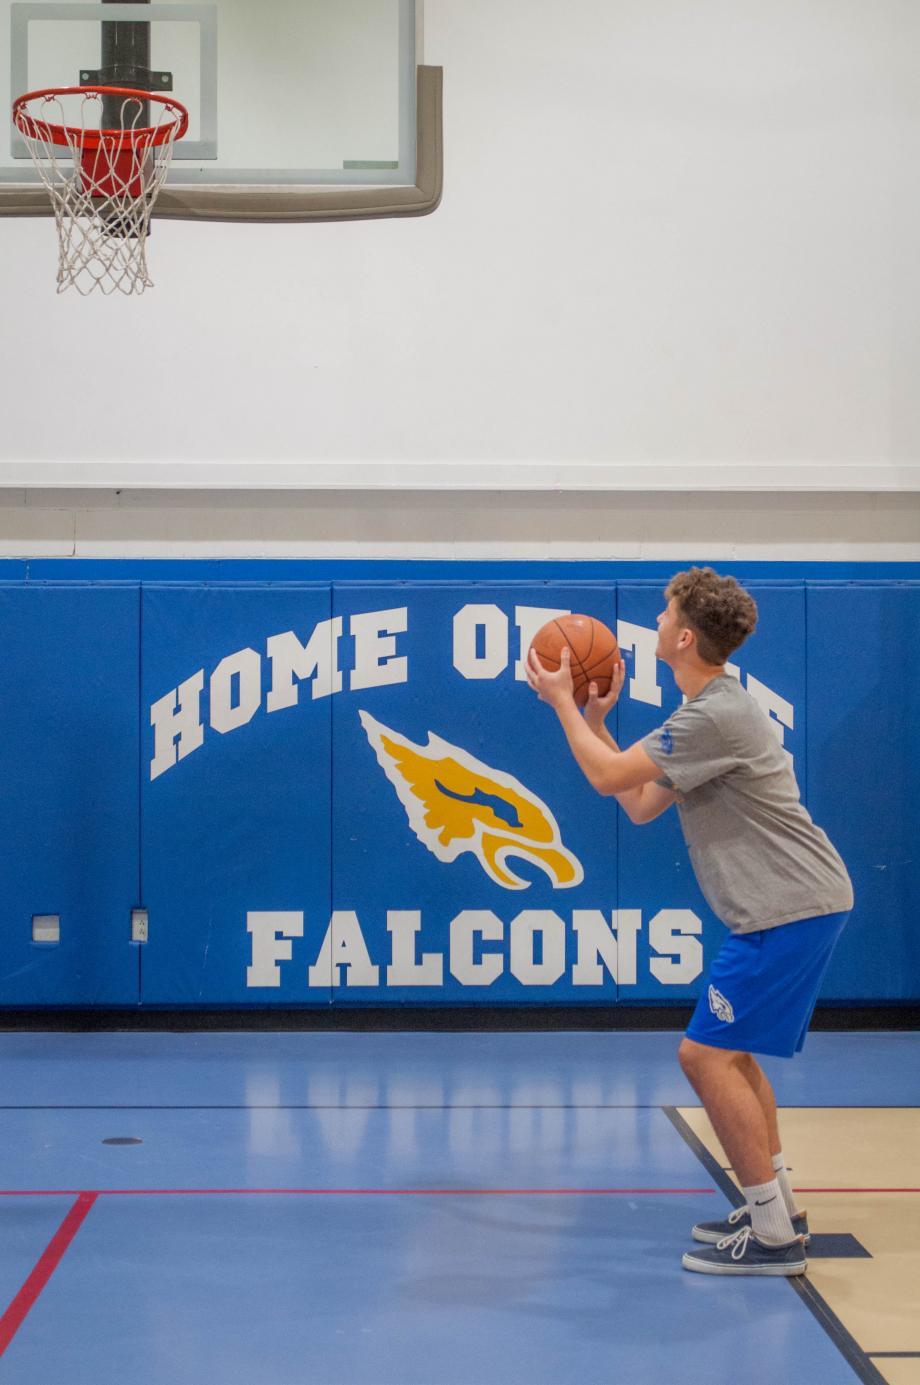 Faith Christian Academy basketball player prepares to make a shot.